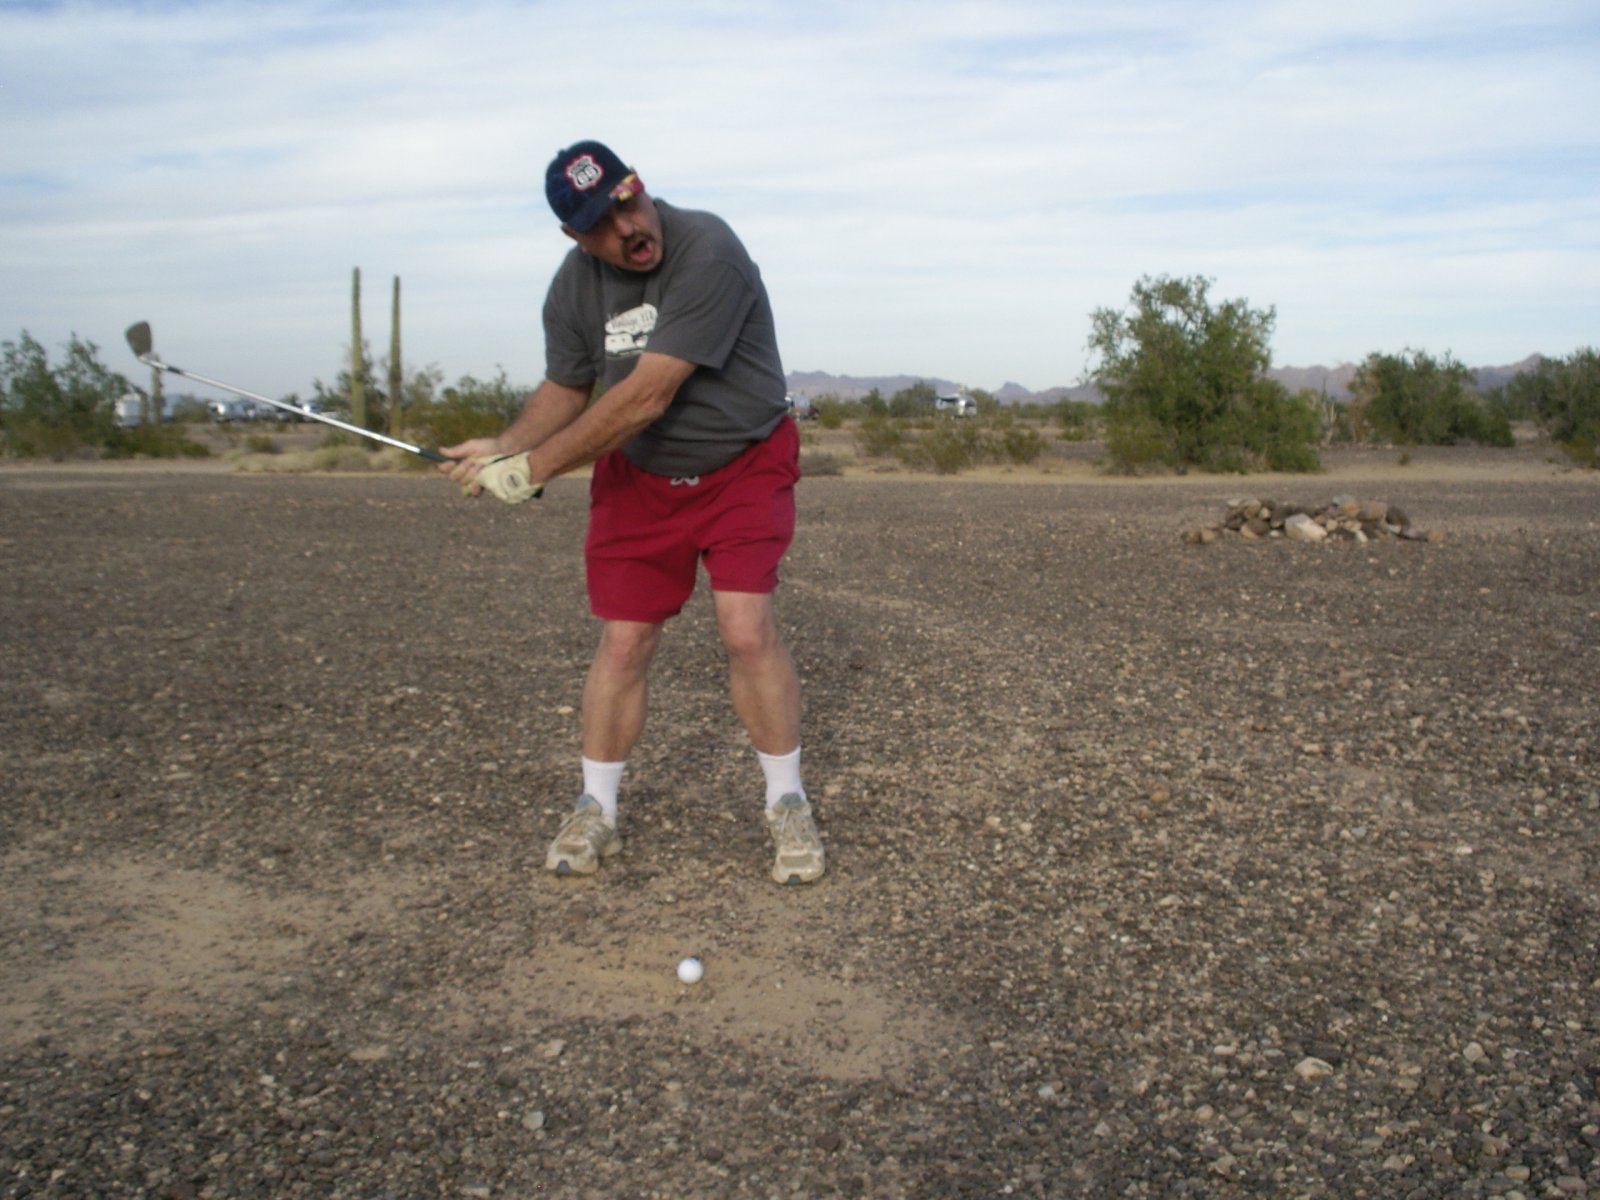 Click image for larger version  Name:AZ Trip Richard desert golf.jpg Views:78 Size:274.2 KB ID:91793